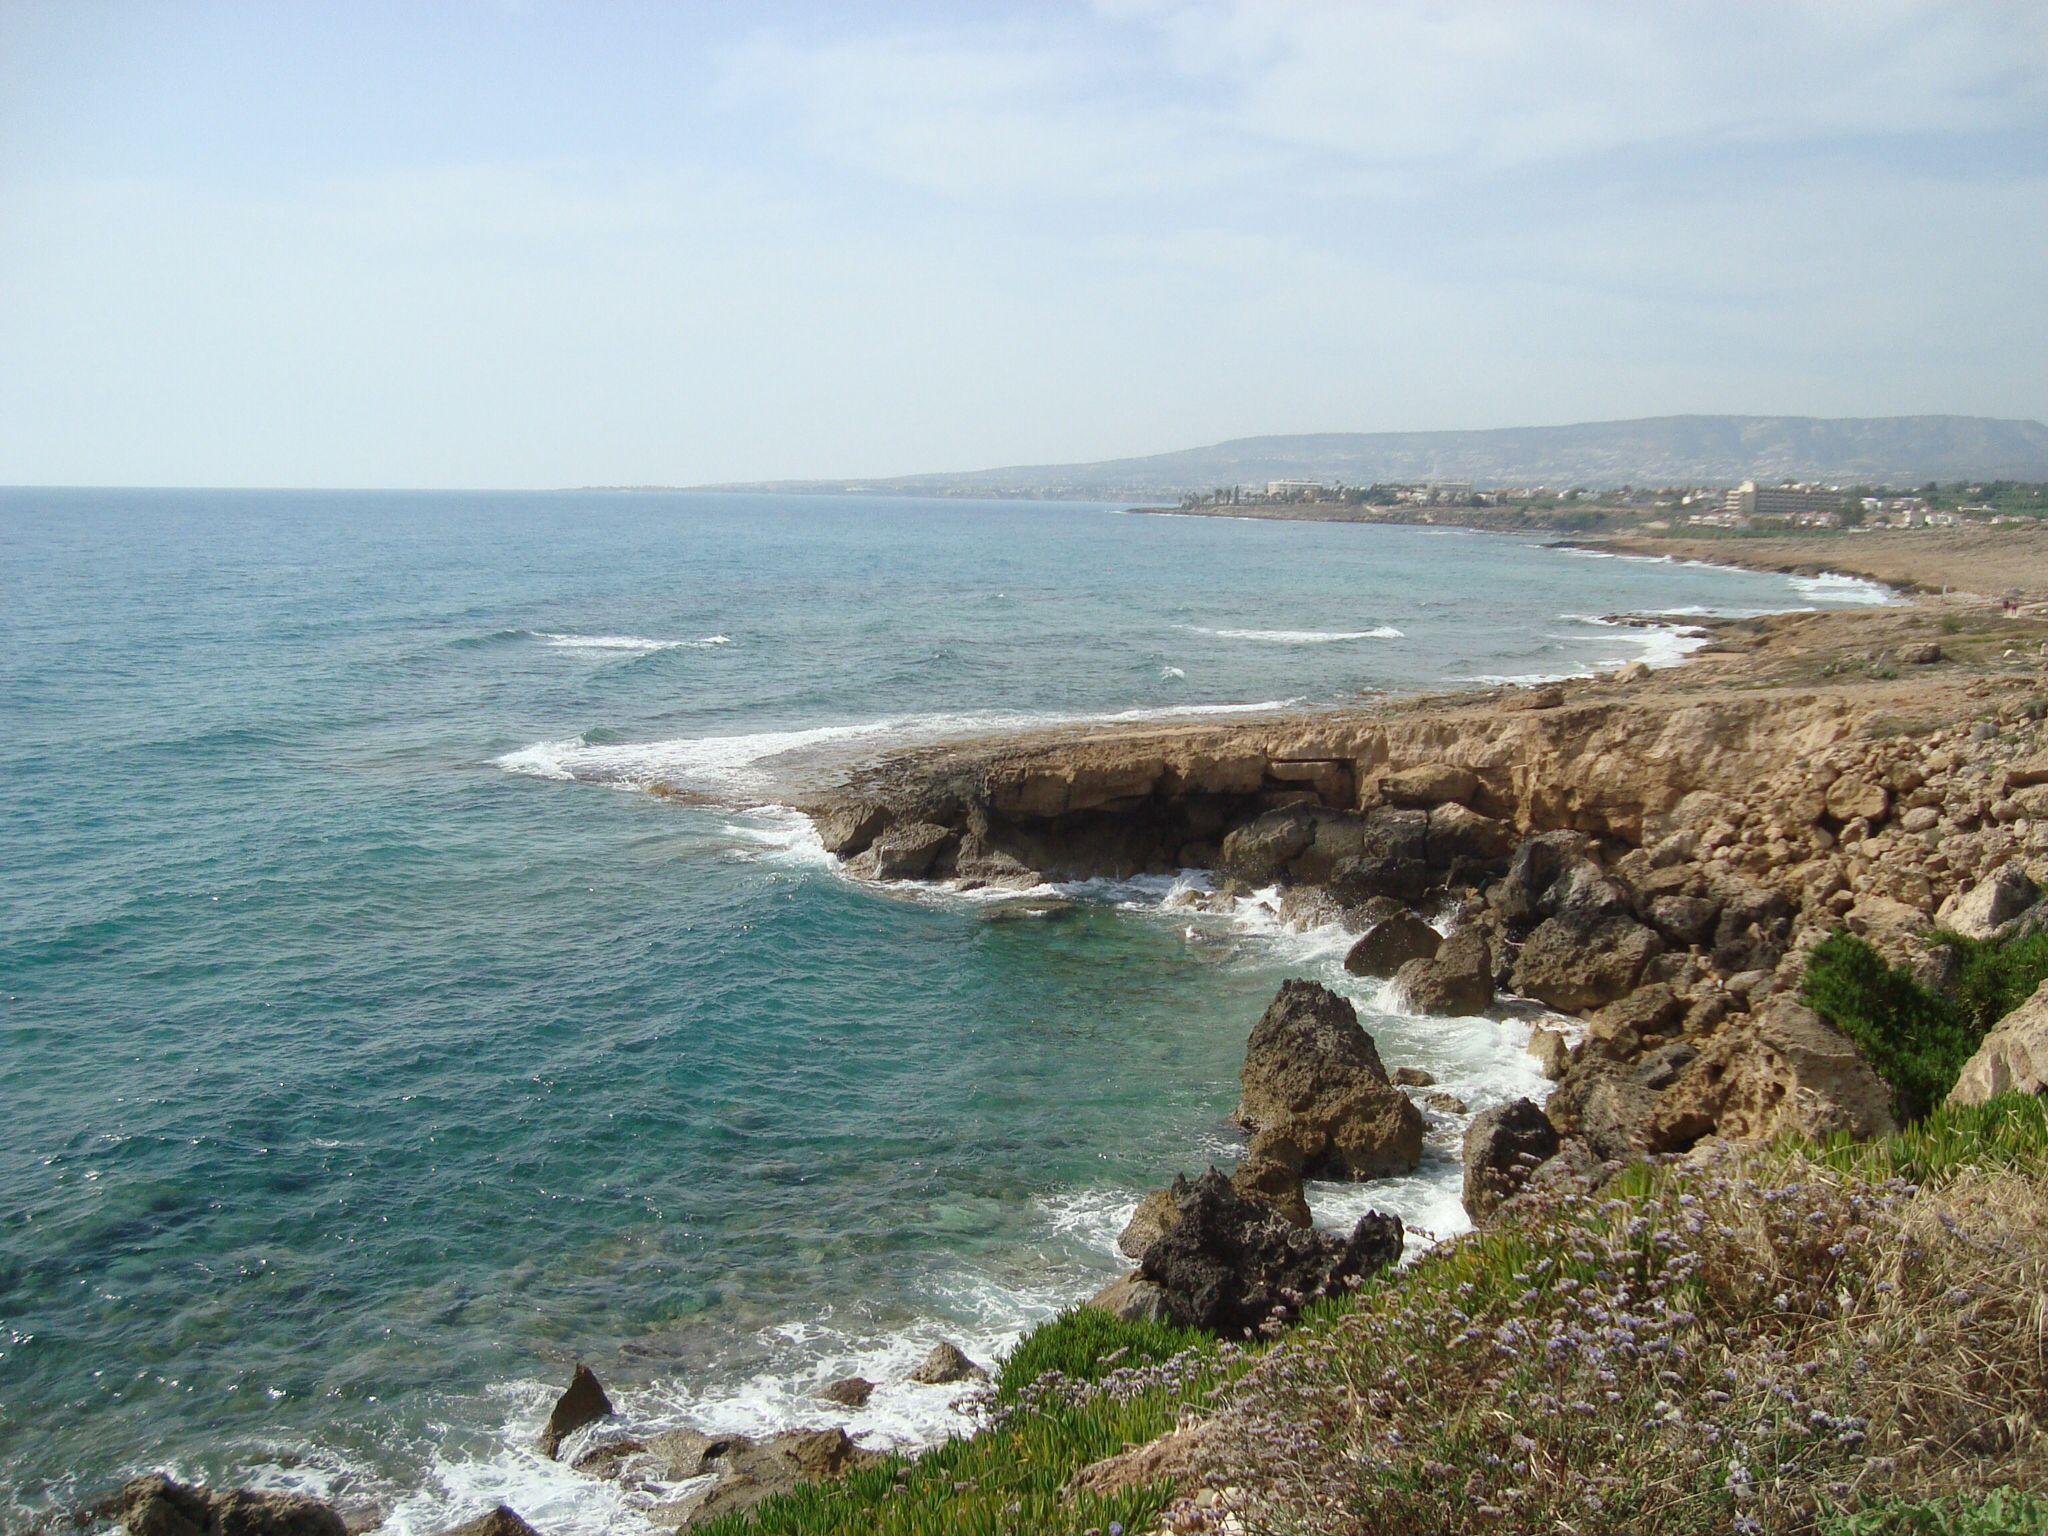 Chypre été 2013